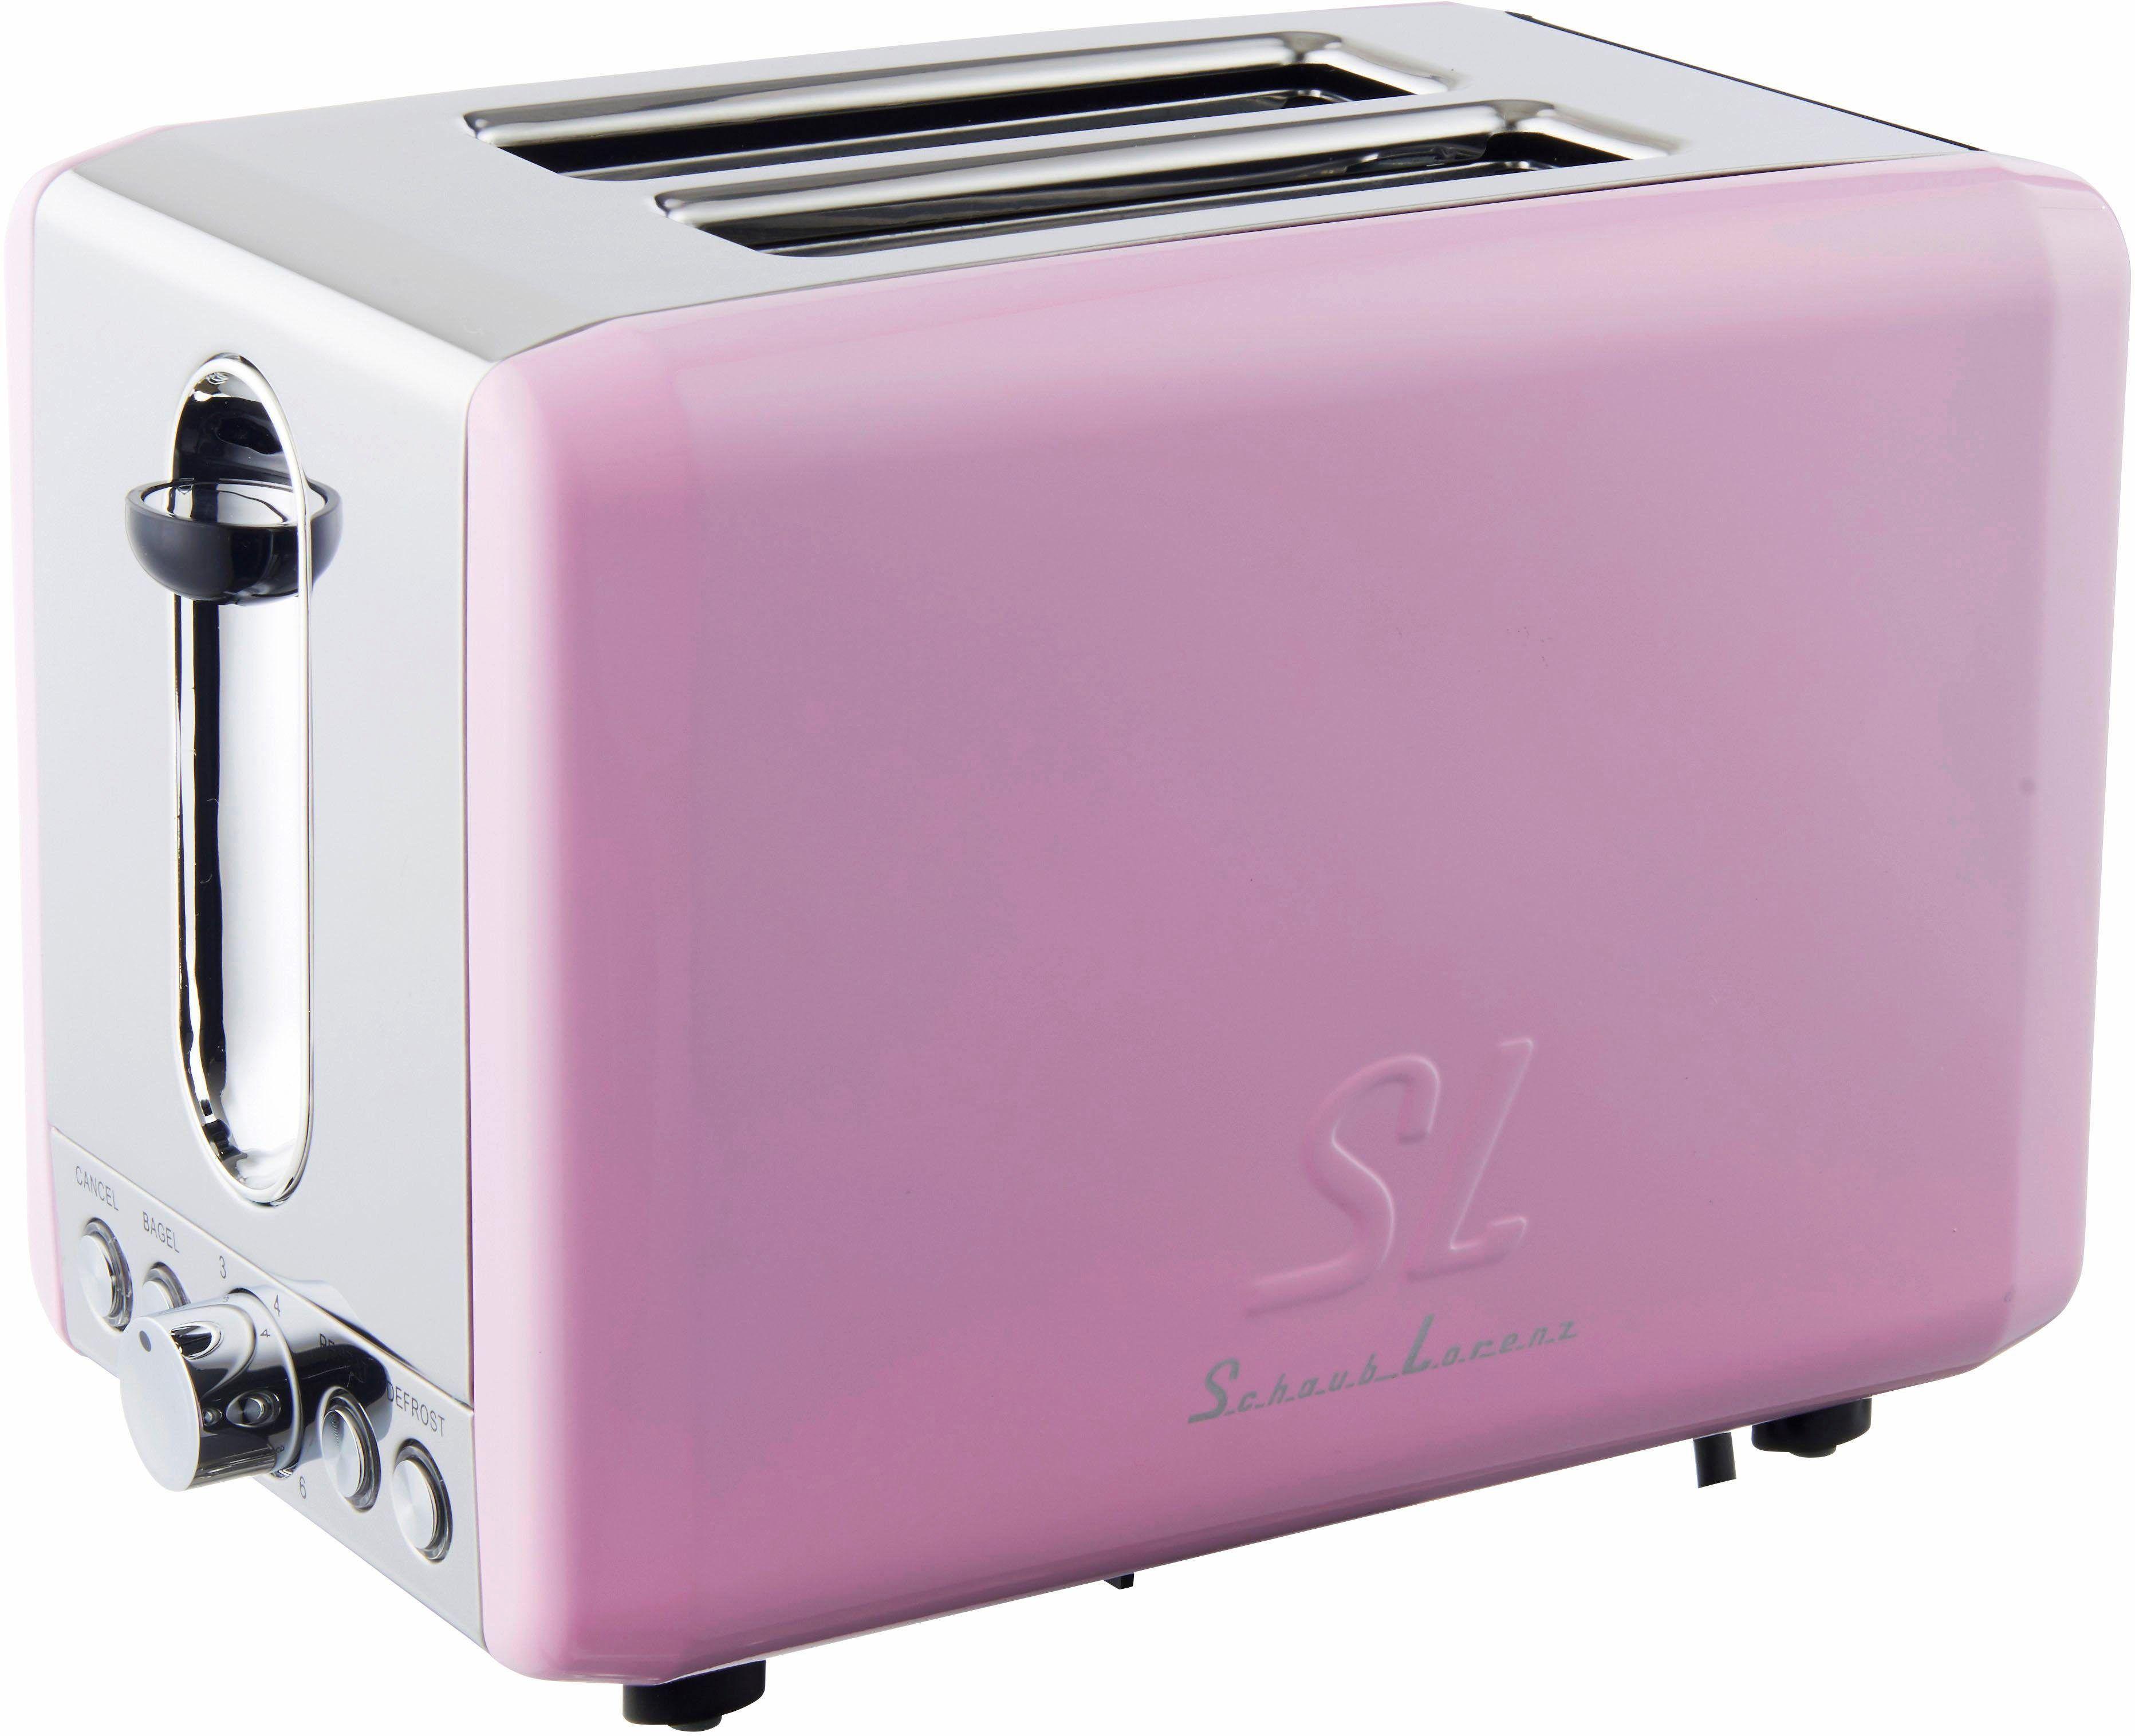 Schaub Lorenz Toaster SL T2.1SP, 850 Watt, pink, rosa | Küchengeräte ...